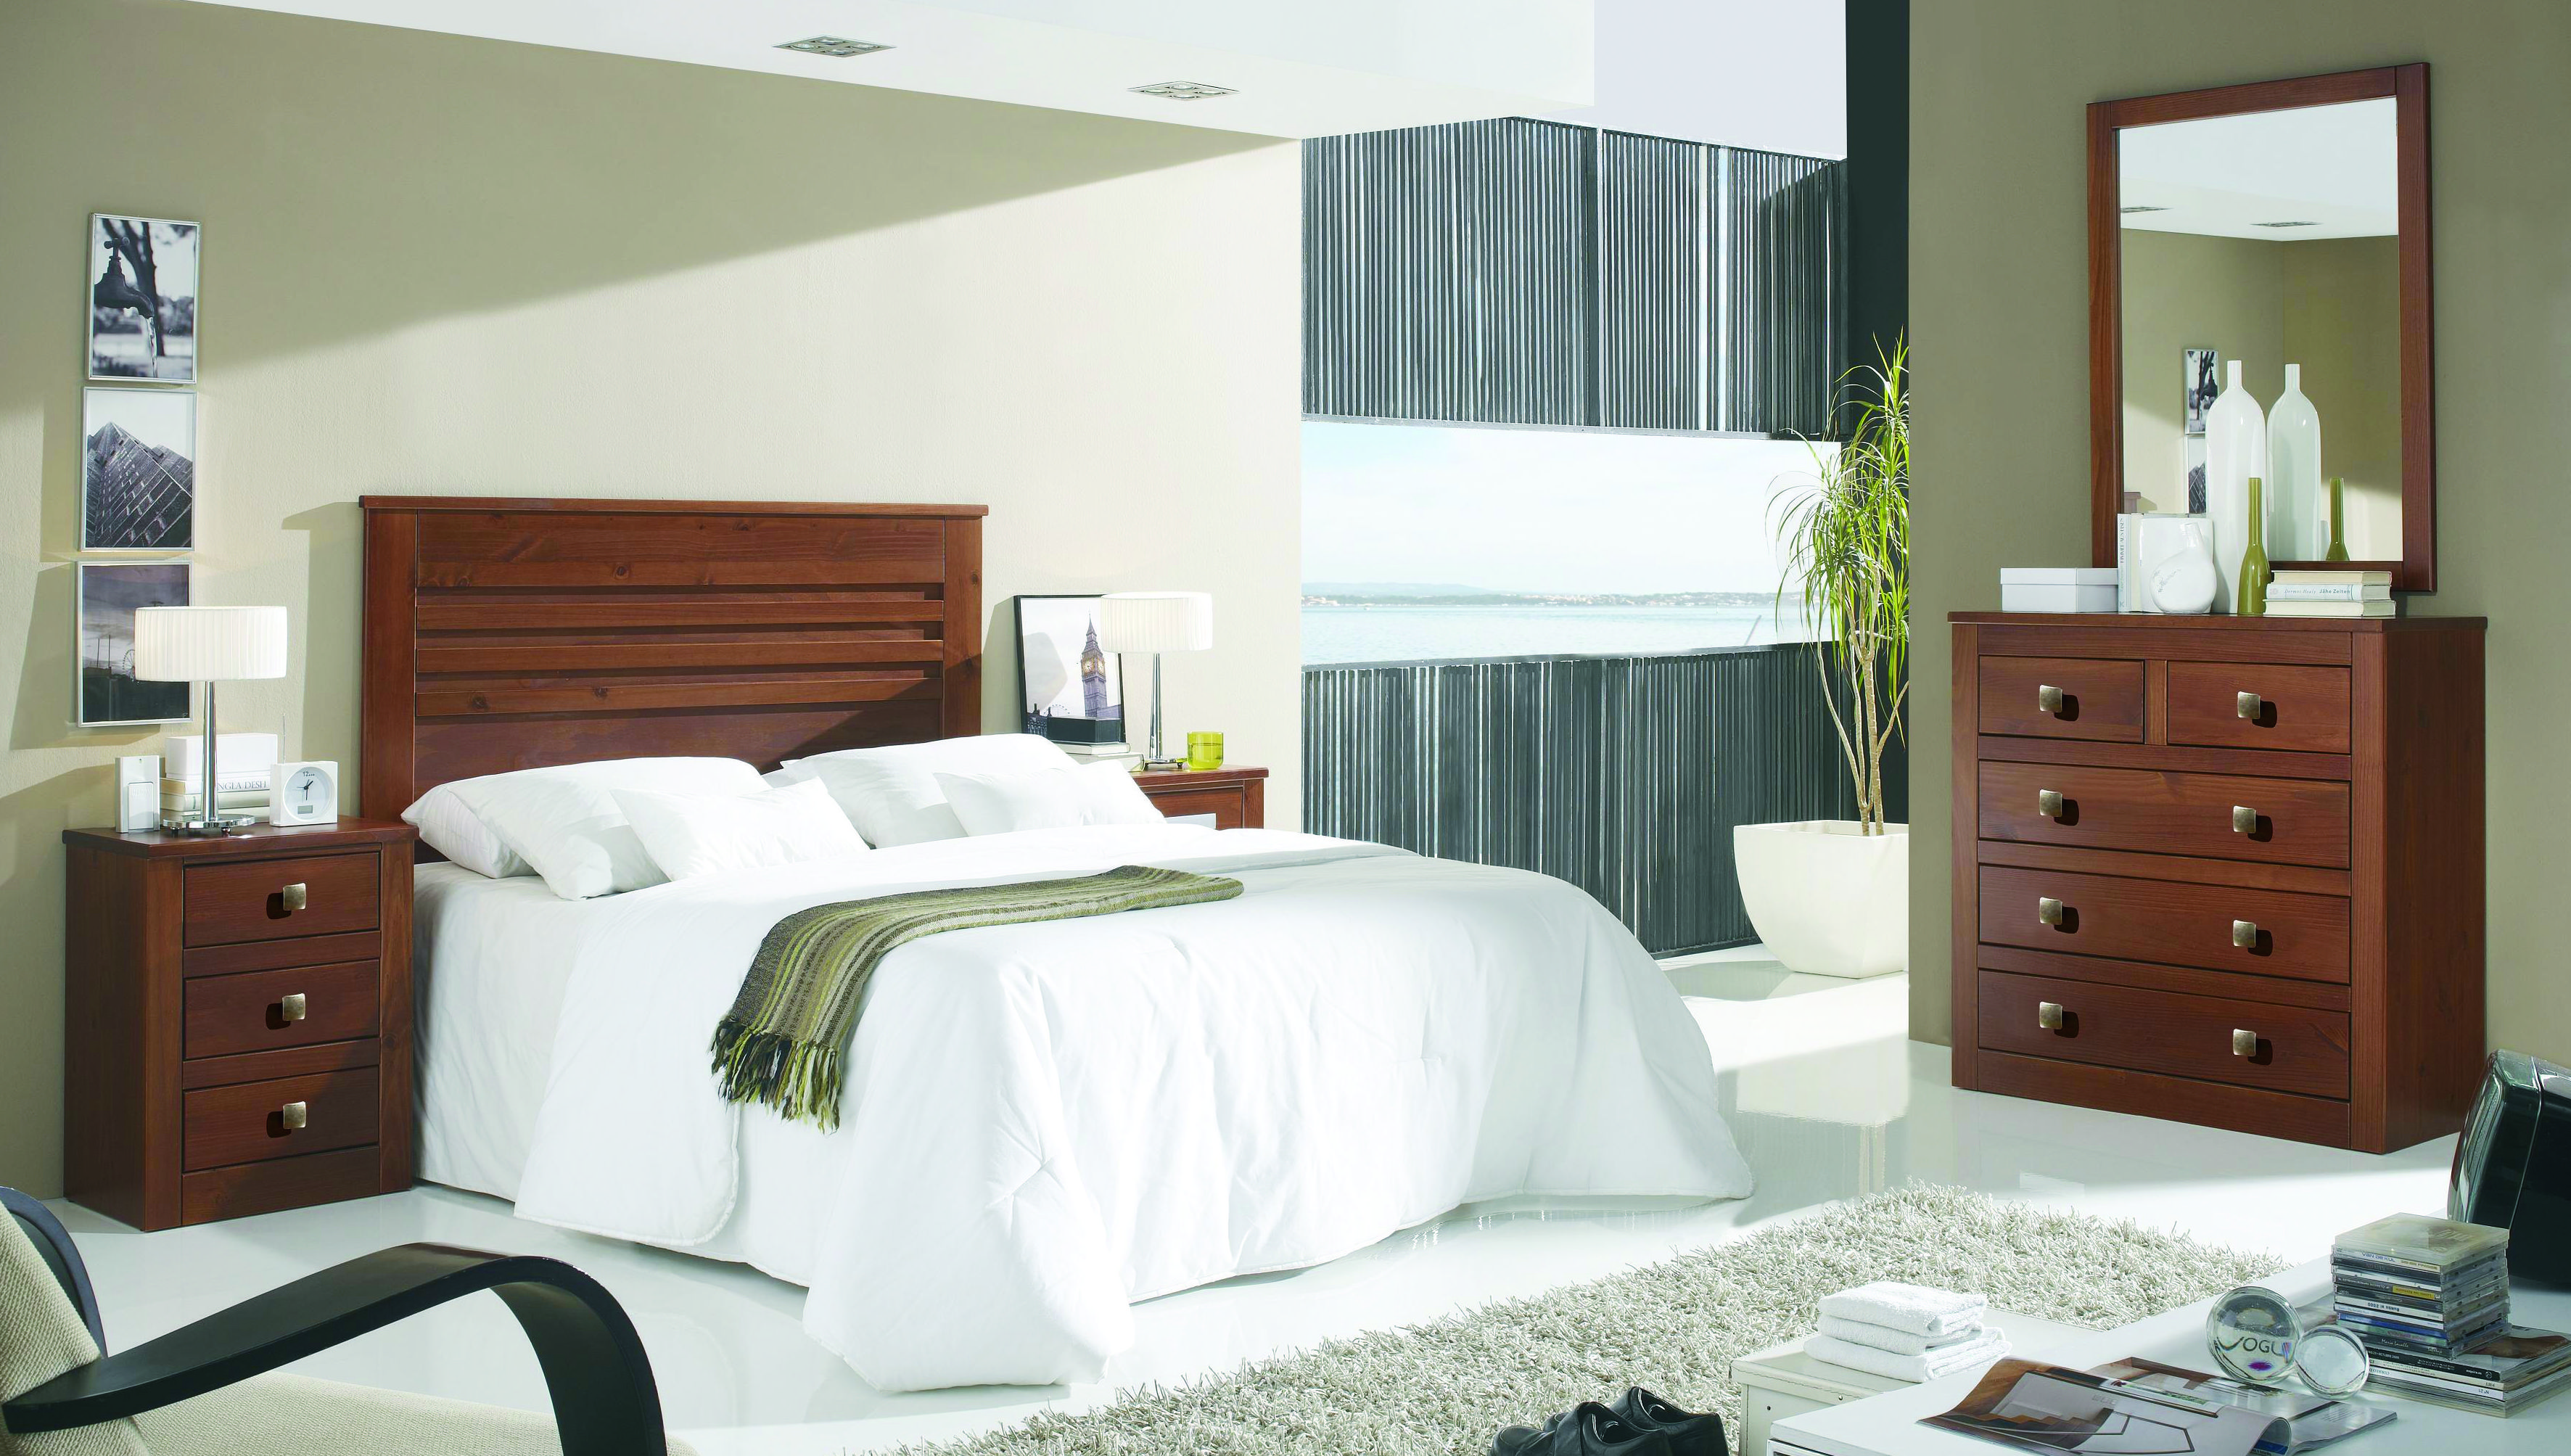 02 dormitorio matrimonio catalogo de muebles san francisco for Catalogo muebles de dormitorio